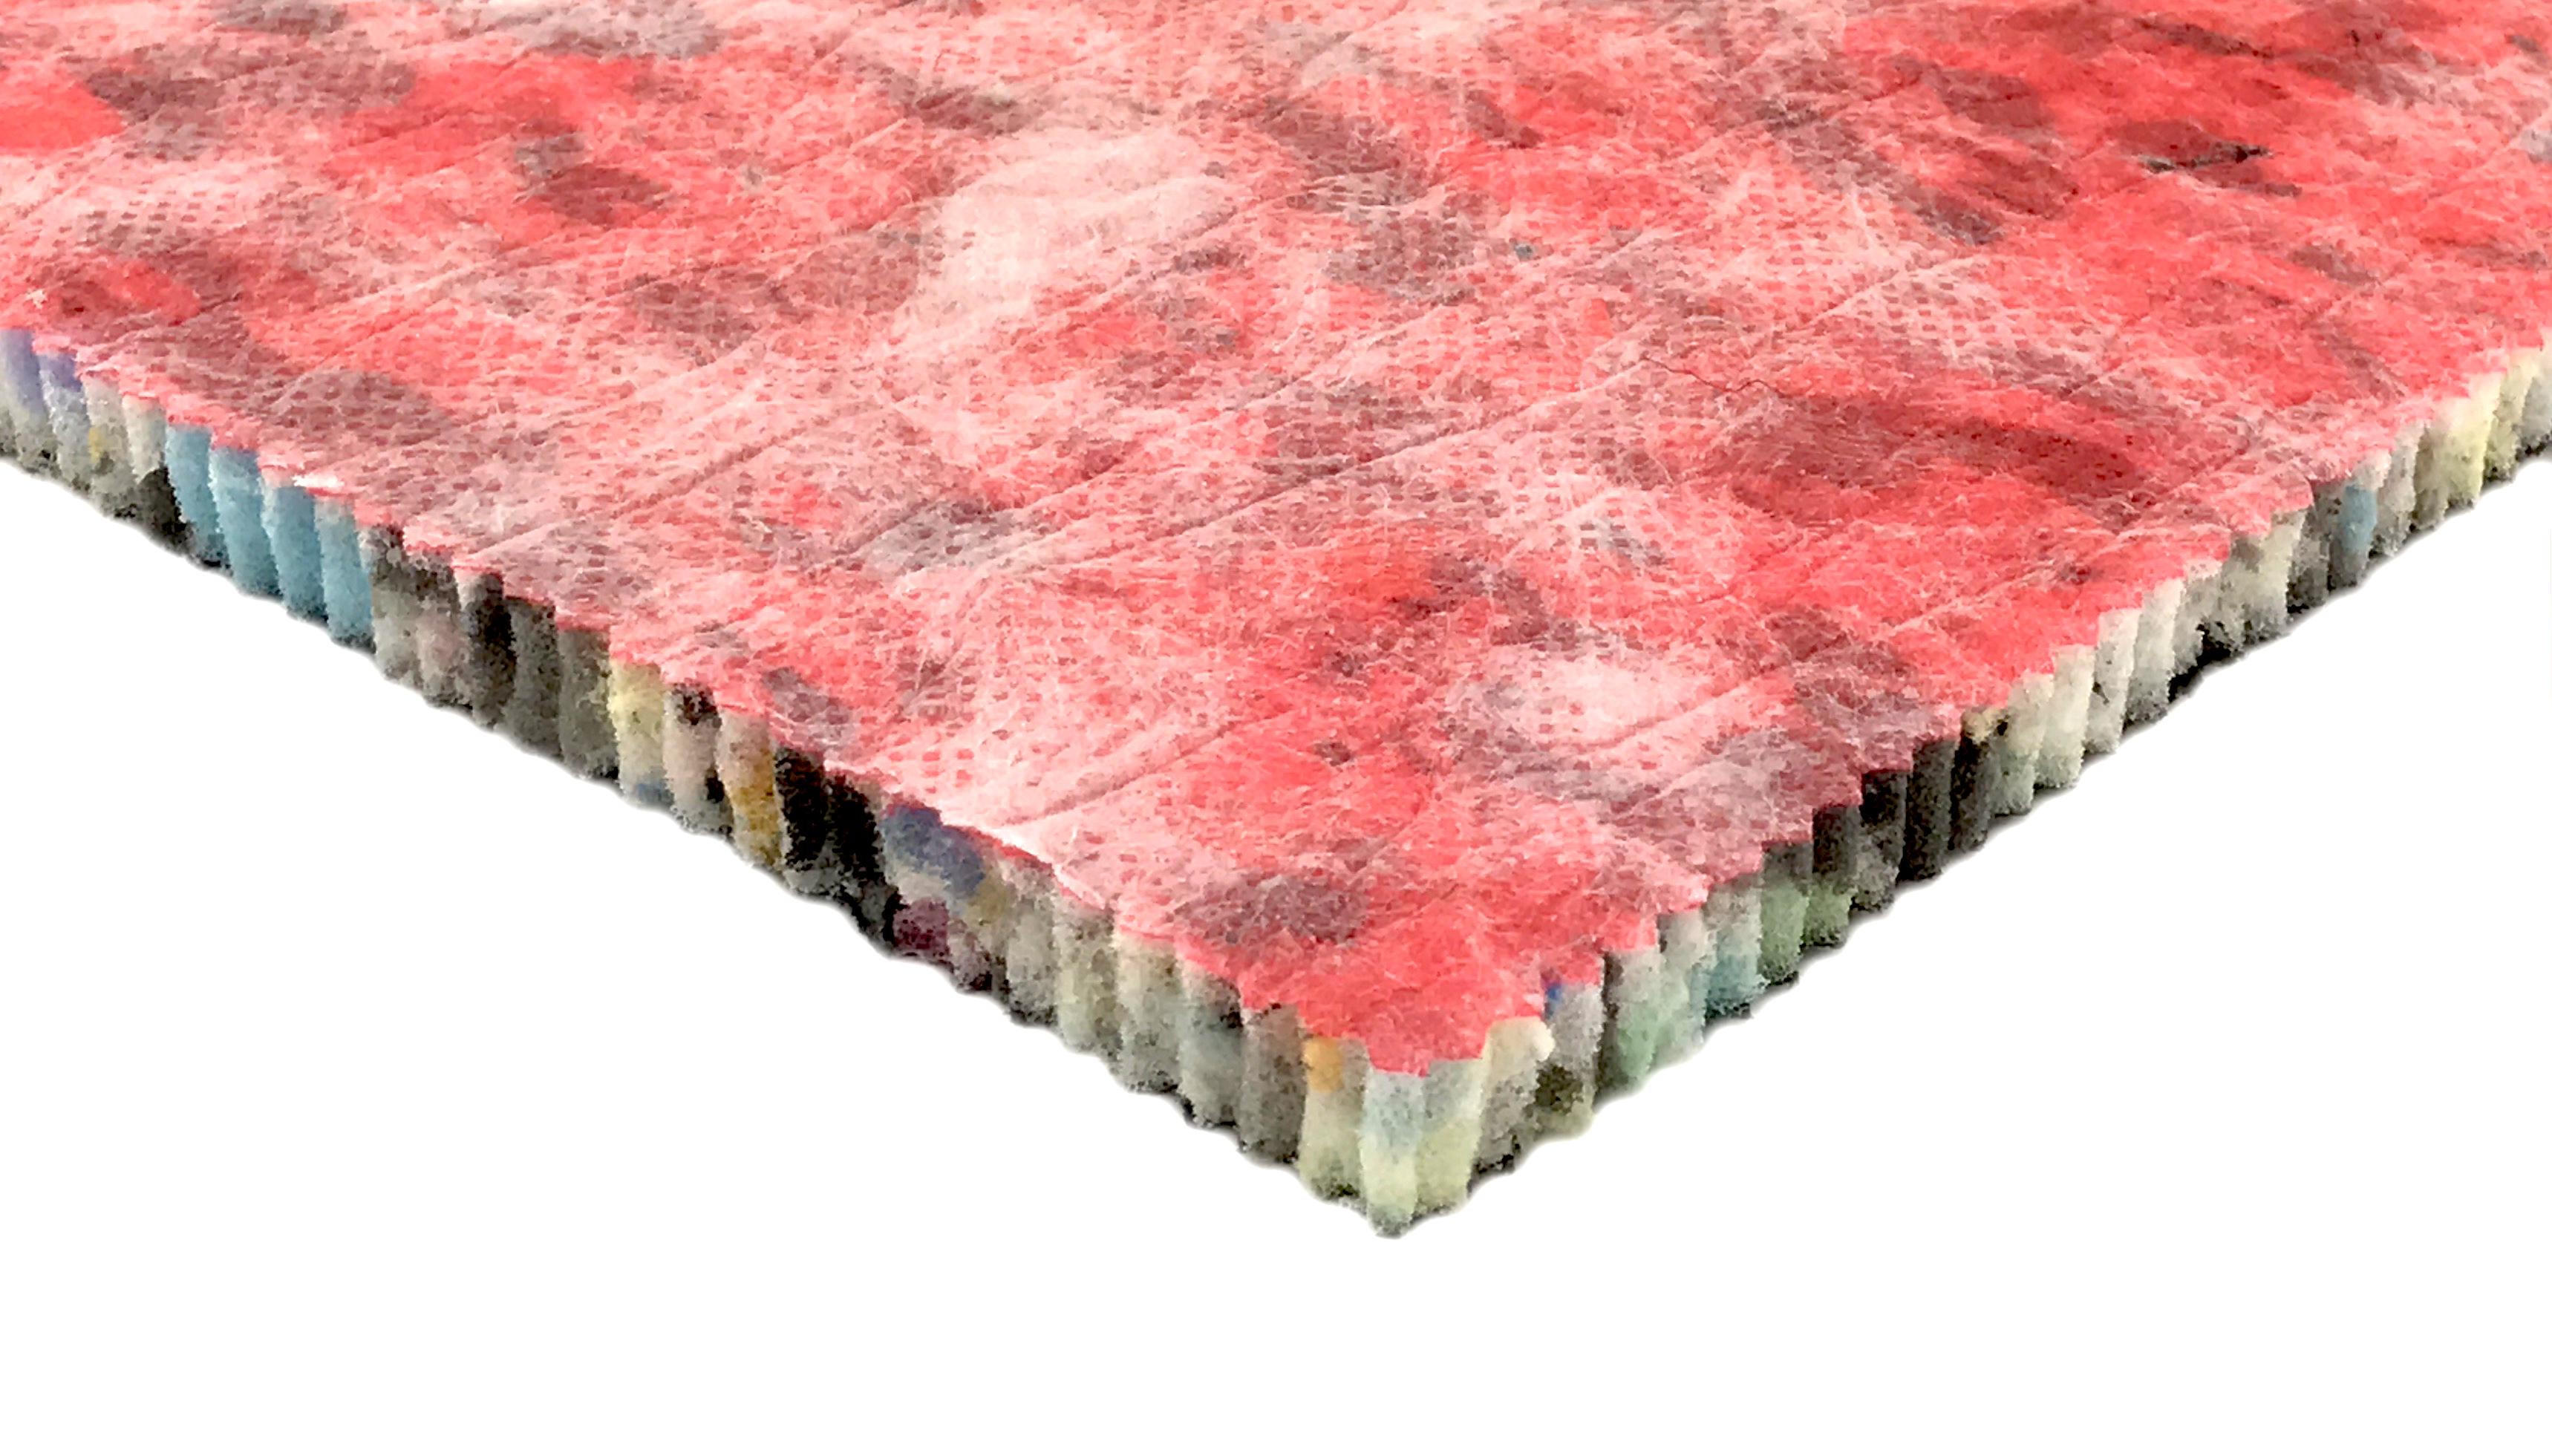 Super 10mm underlay - British Flooring